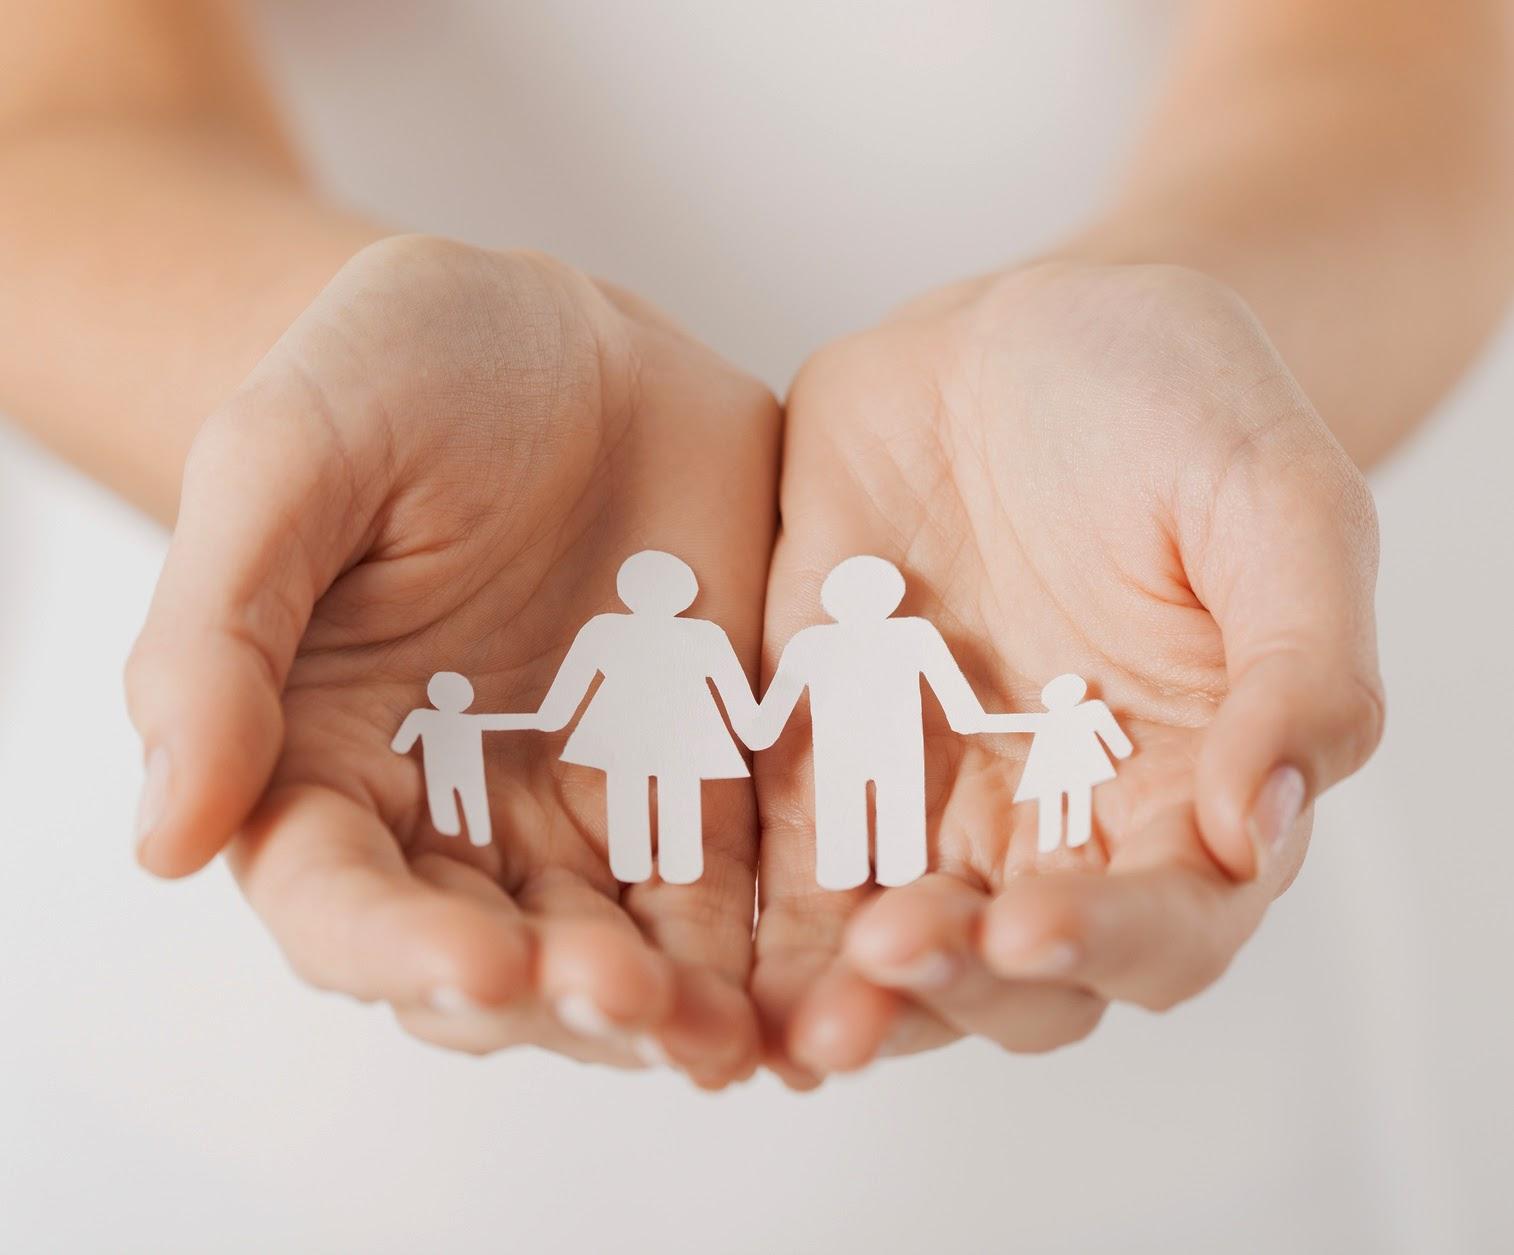 Sudebnyj-proizvol-ili-kak-vosstanovit-roditelskie-prava